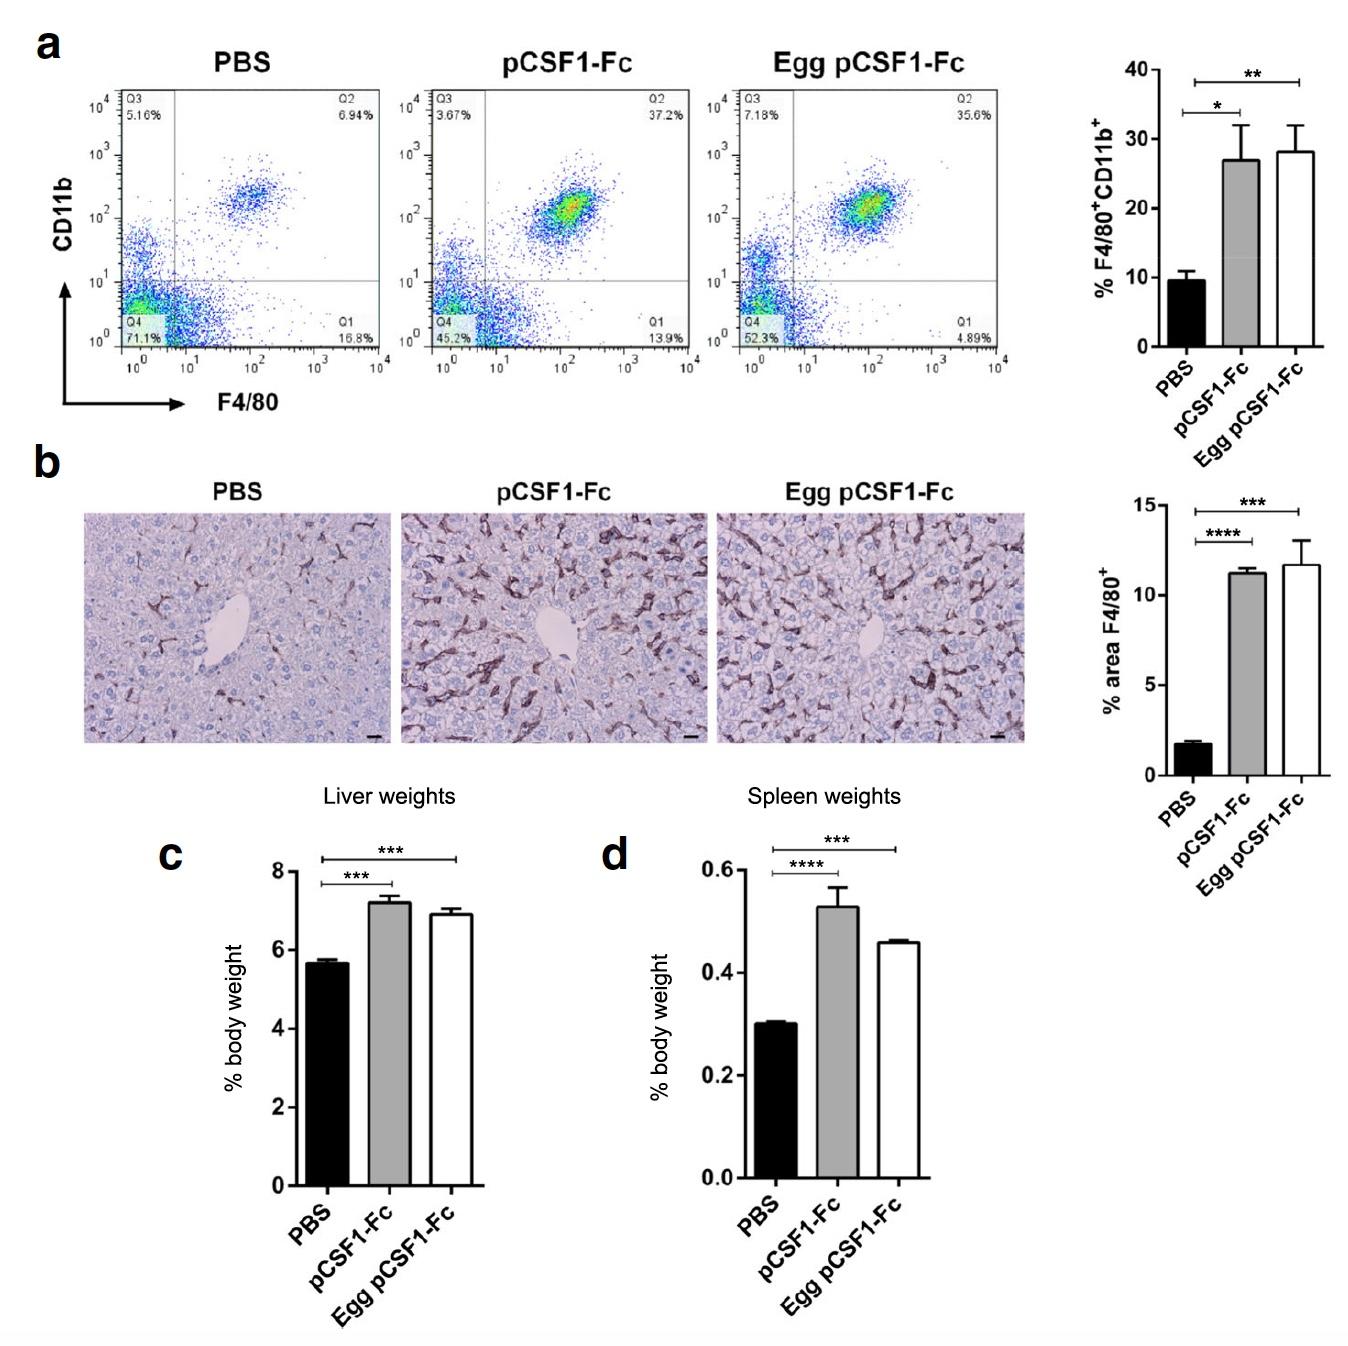 Генетика и куры: белок CSF1-Fc человека в яичном белке - 4